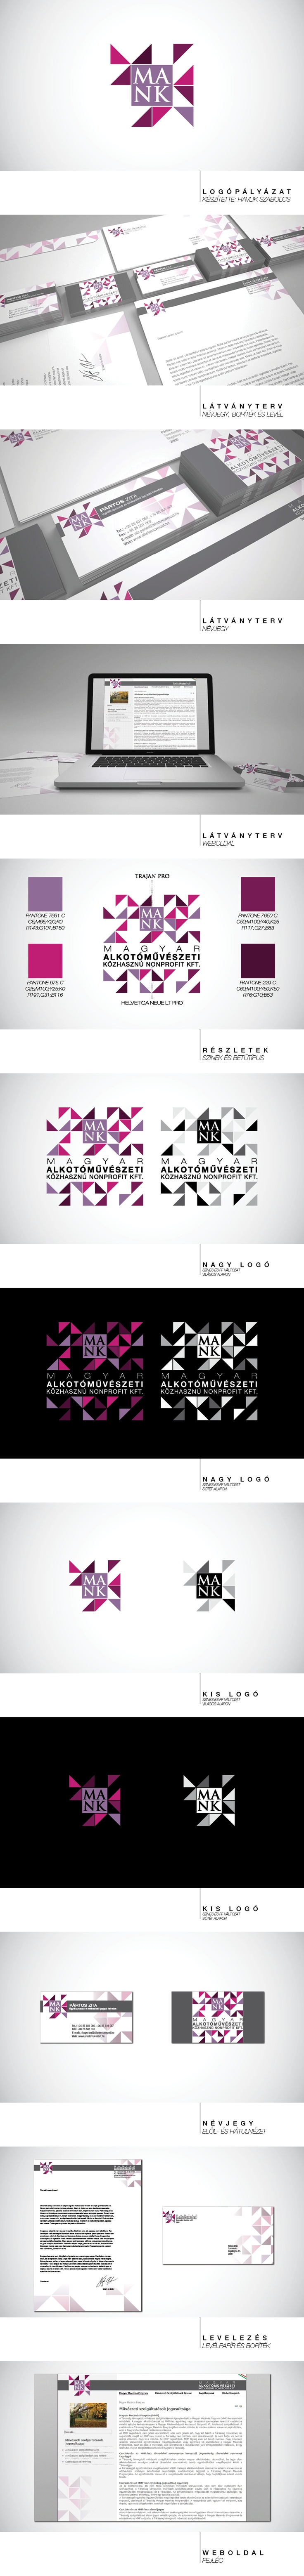 MANK, branding, acrulati pályázat, logo